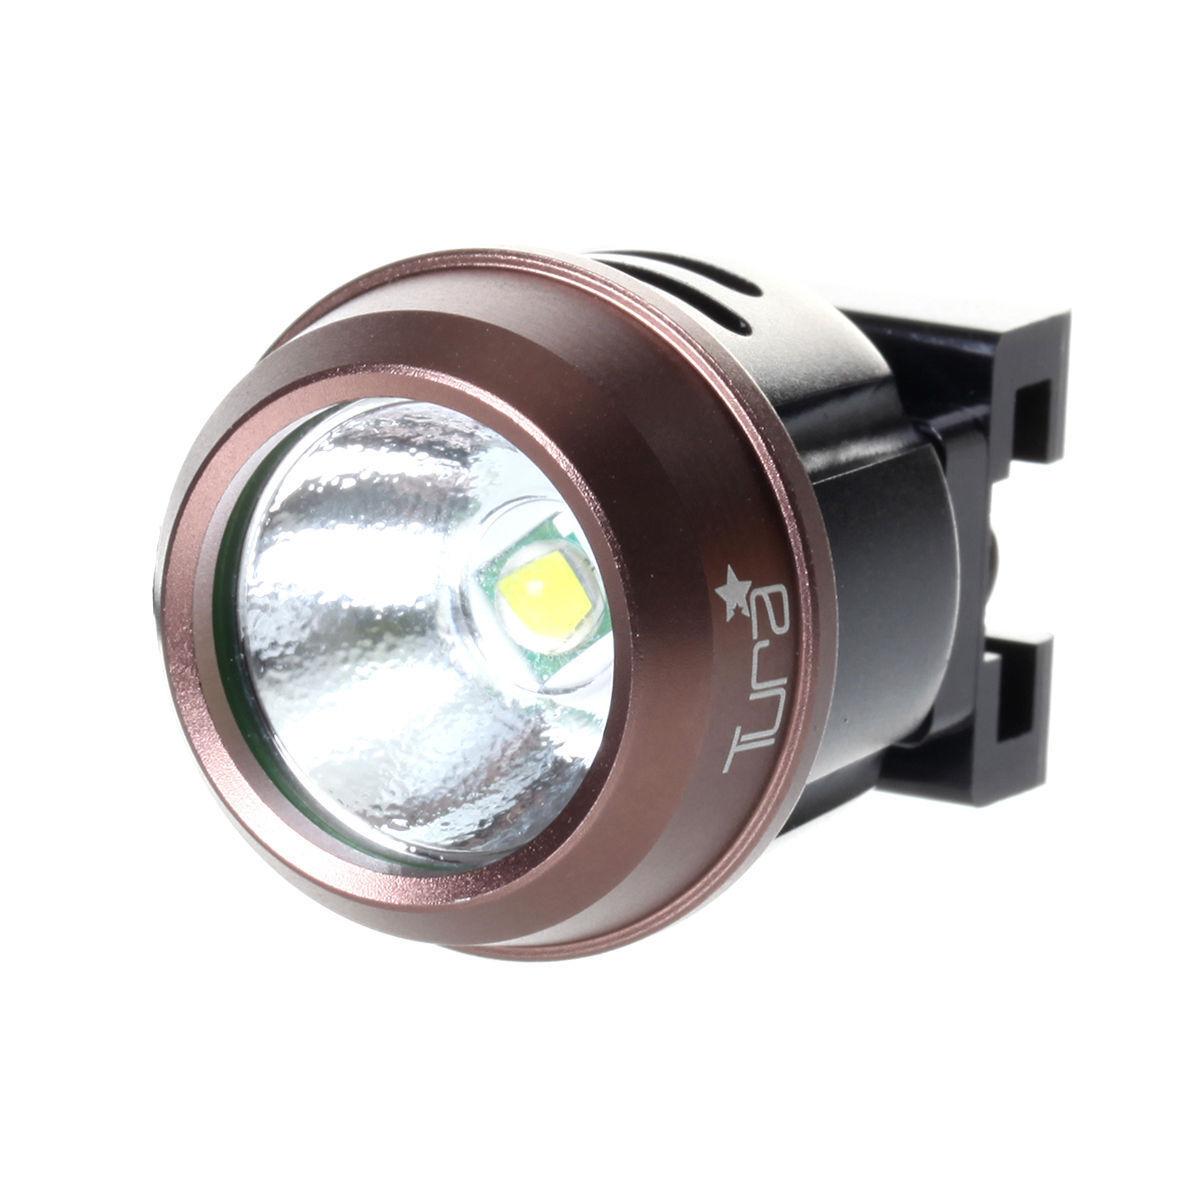 TURA SPRITE HIGH POWER MTB 850 LUMEN LED FRONT MTB POWER ROAD BIKE LIGHT REMOTE BUTTON 1b869d